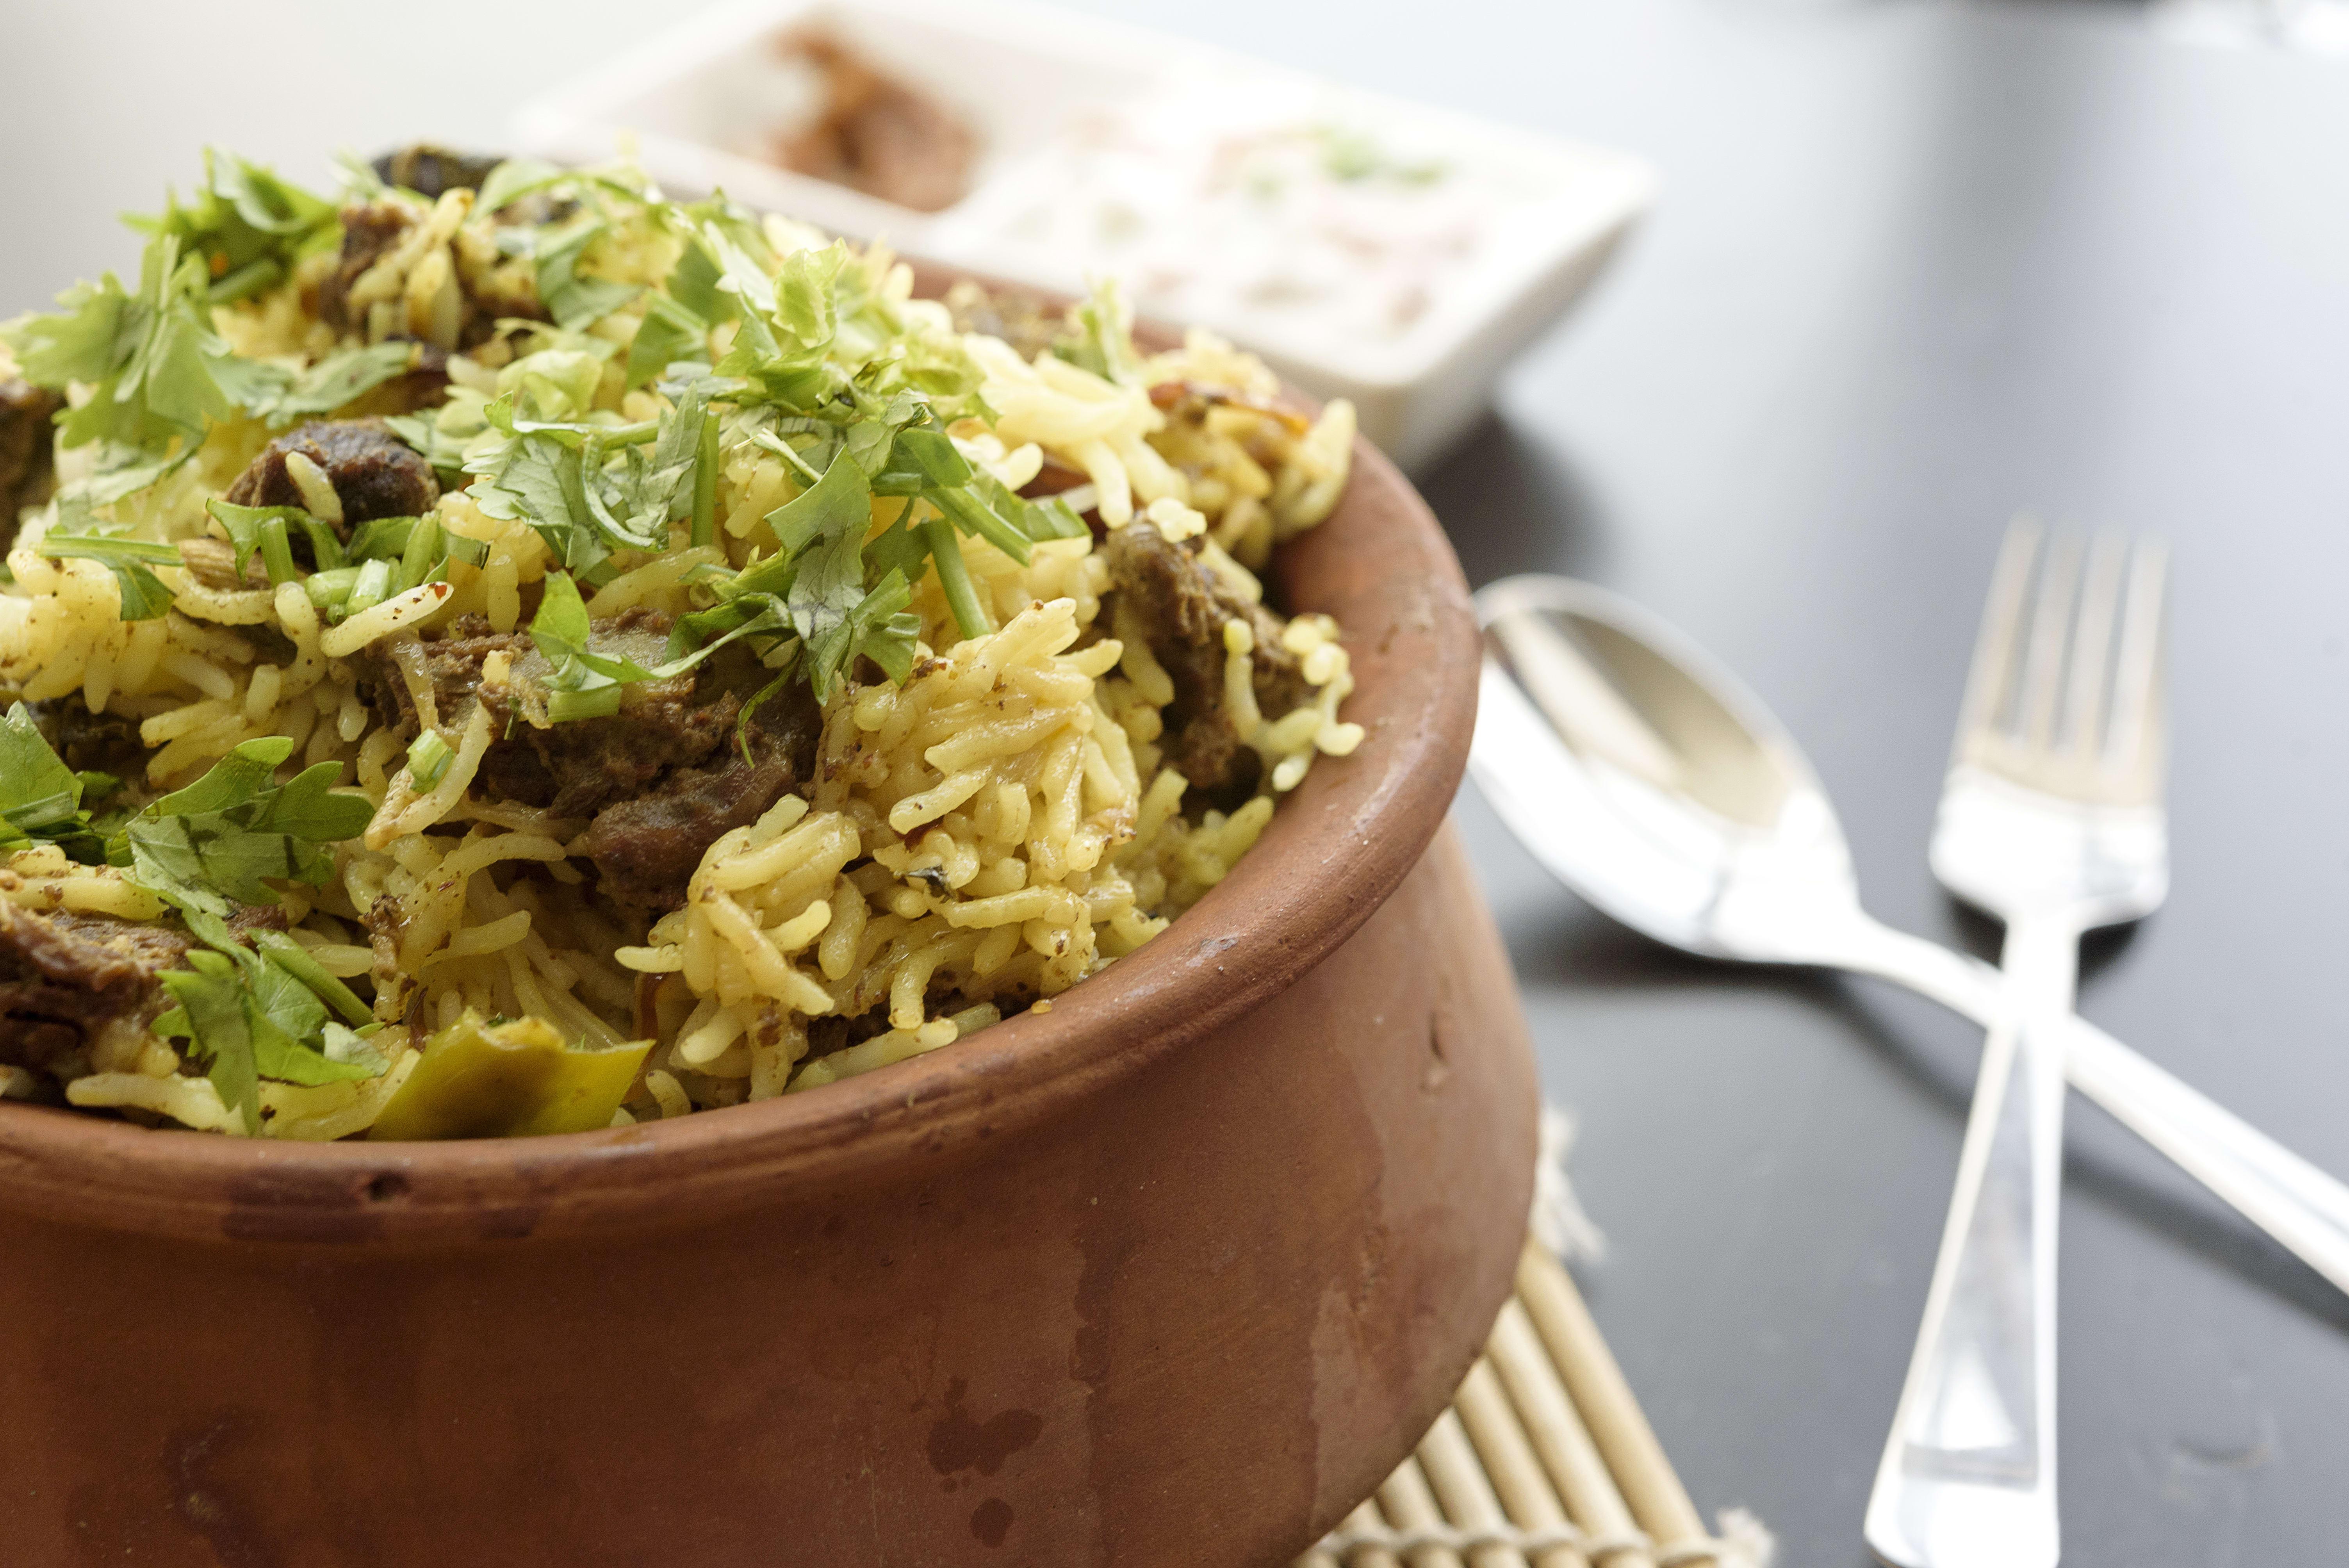 Order Food Online From Restaurants In Bellandur Bangalore